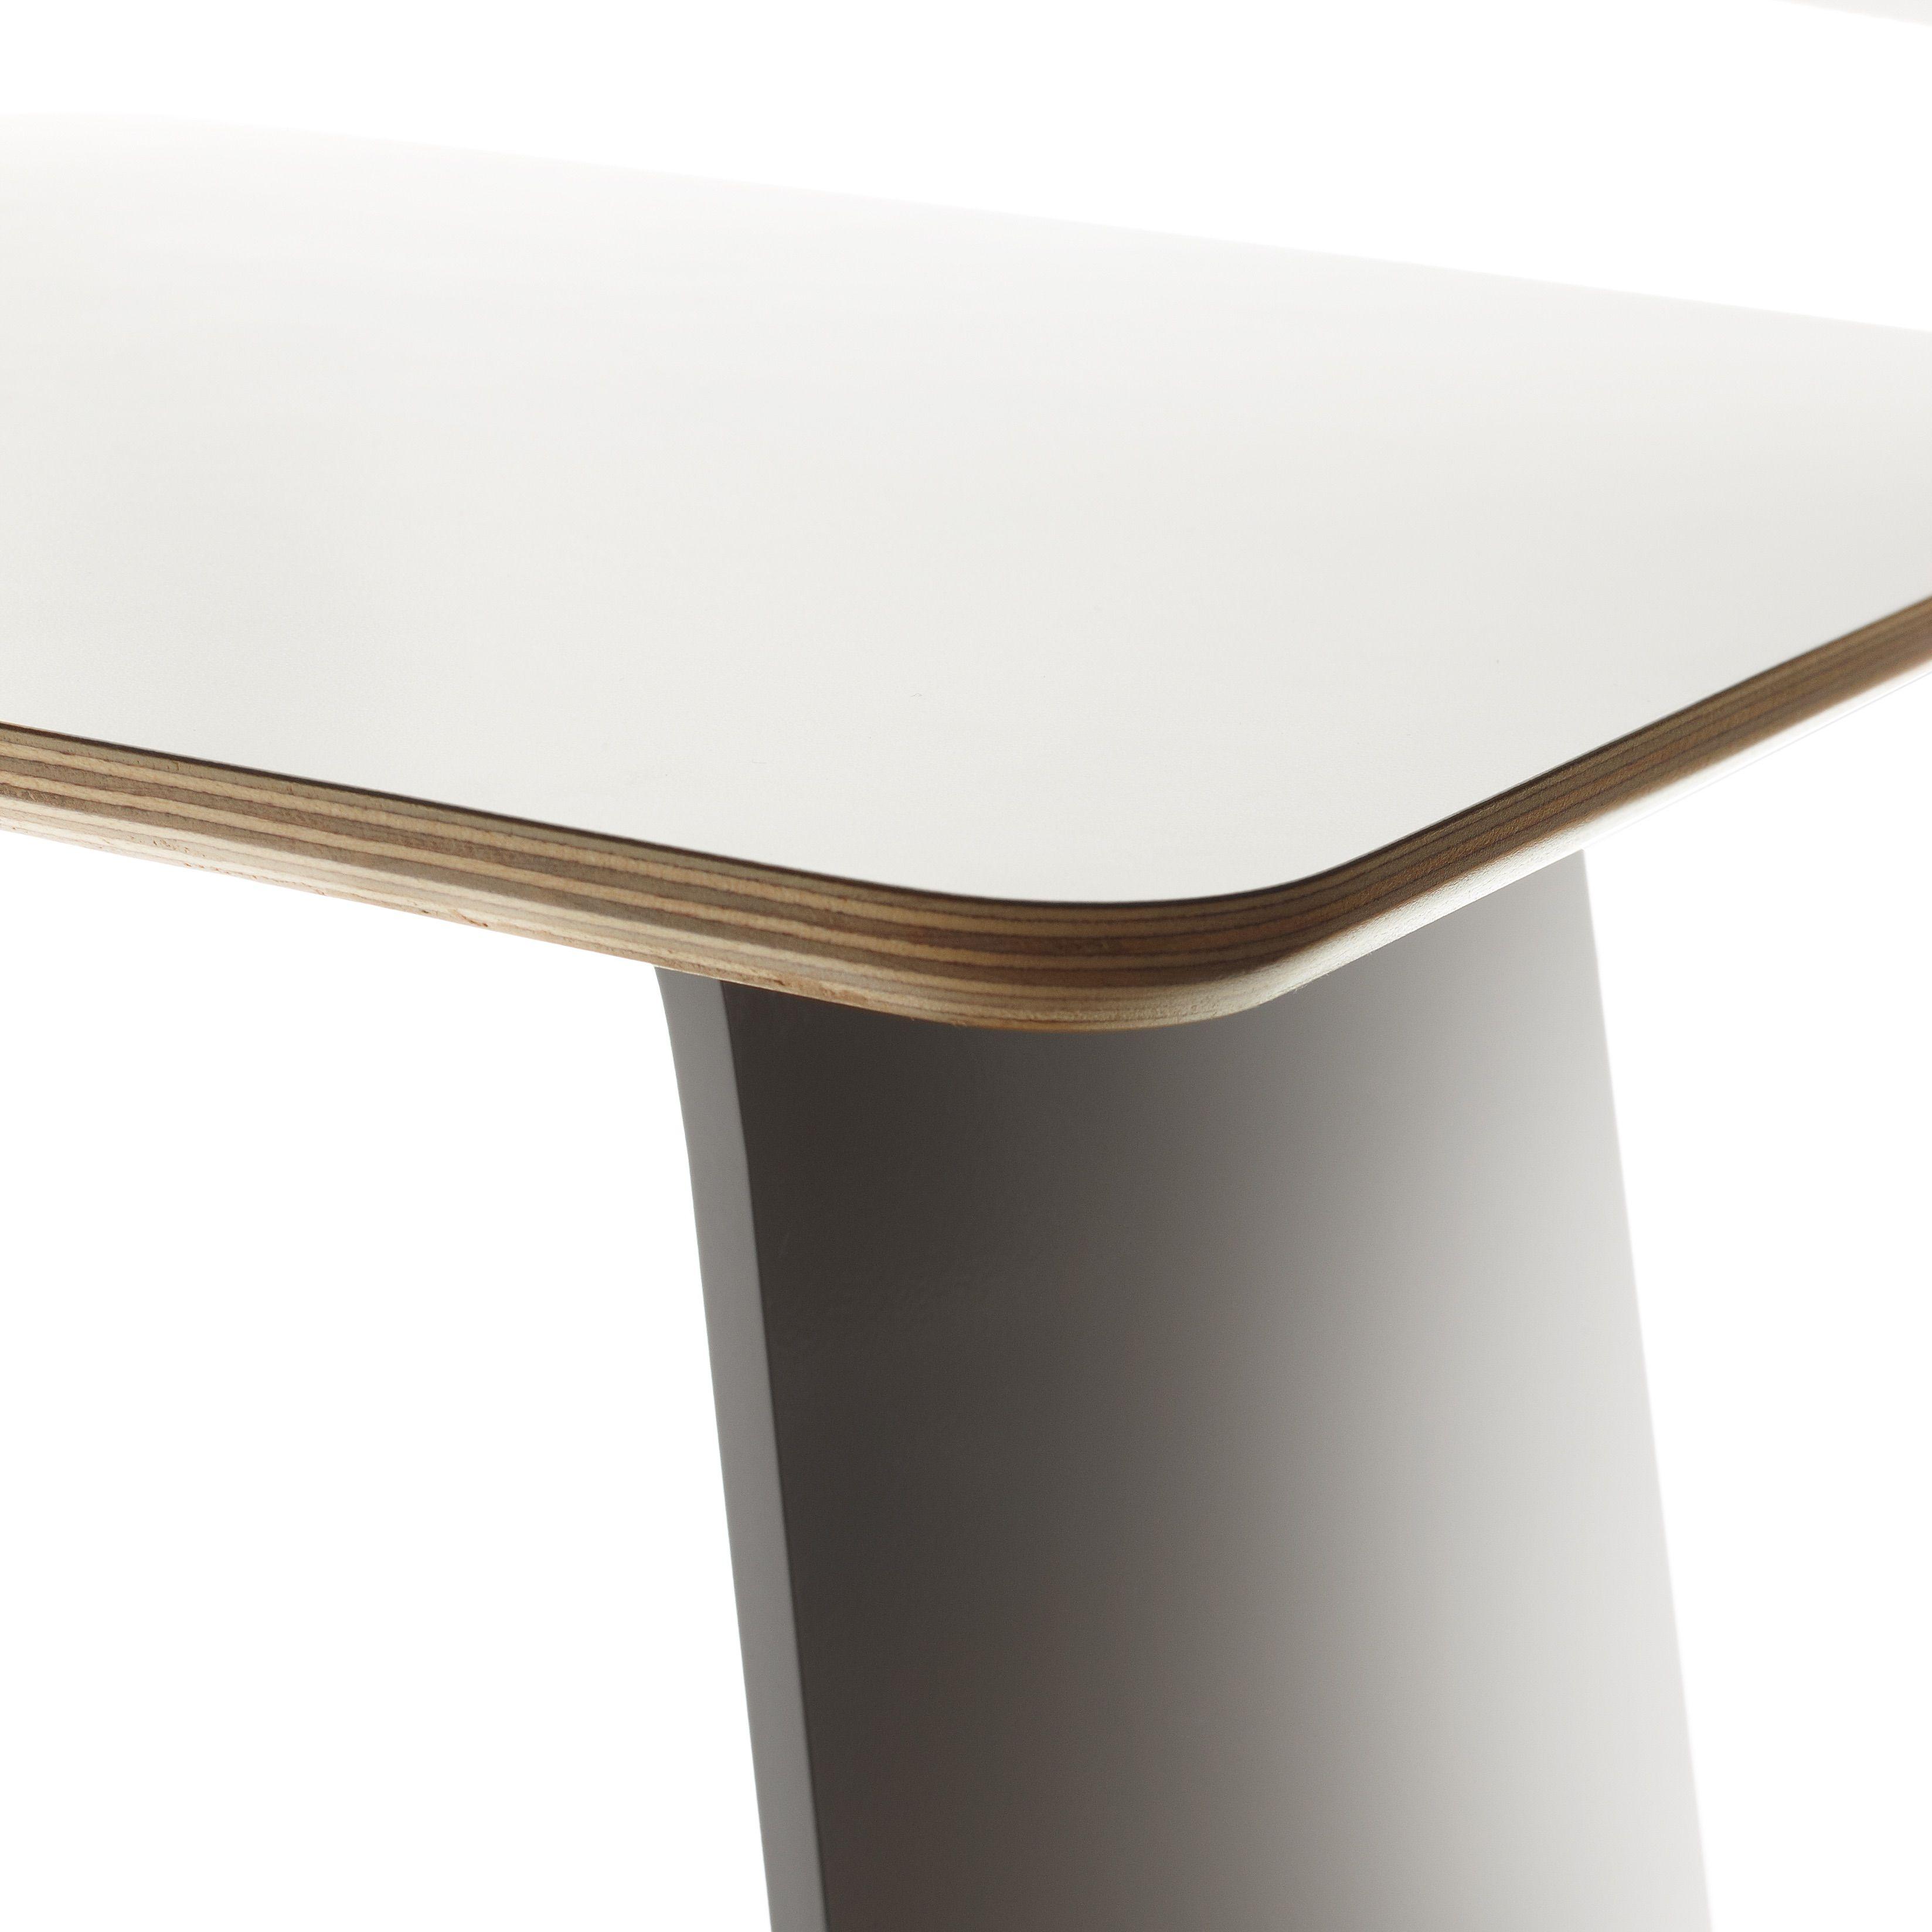 Move Table White Laminate Top Ply Edge Table White Laminate